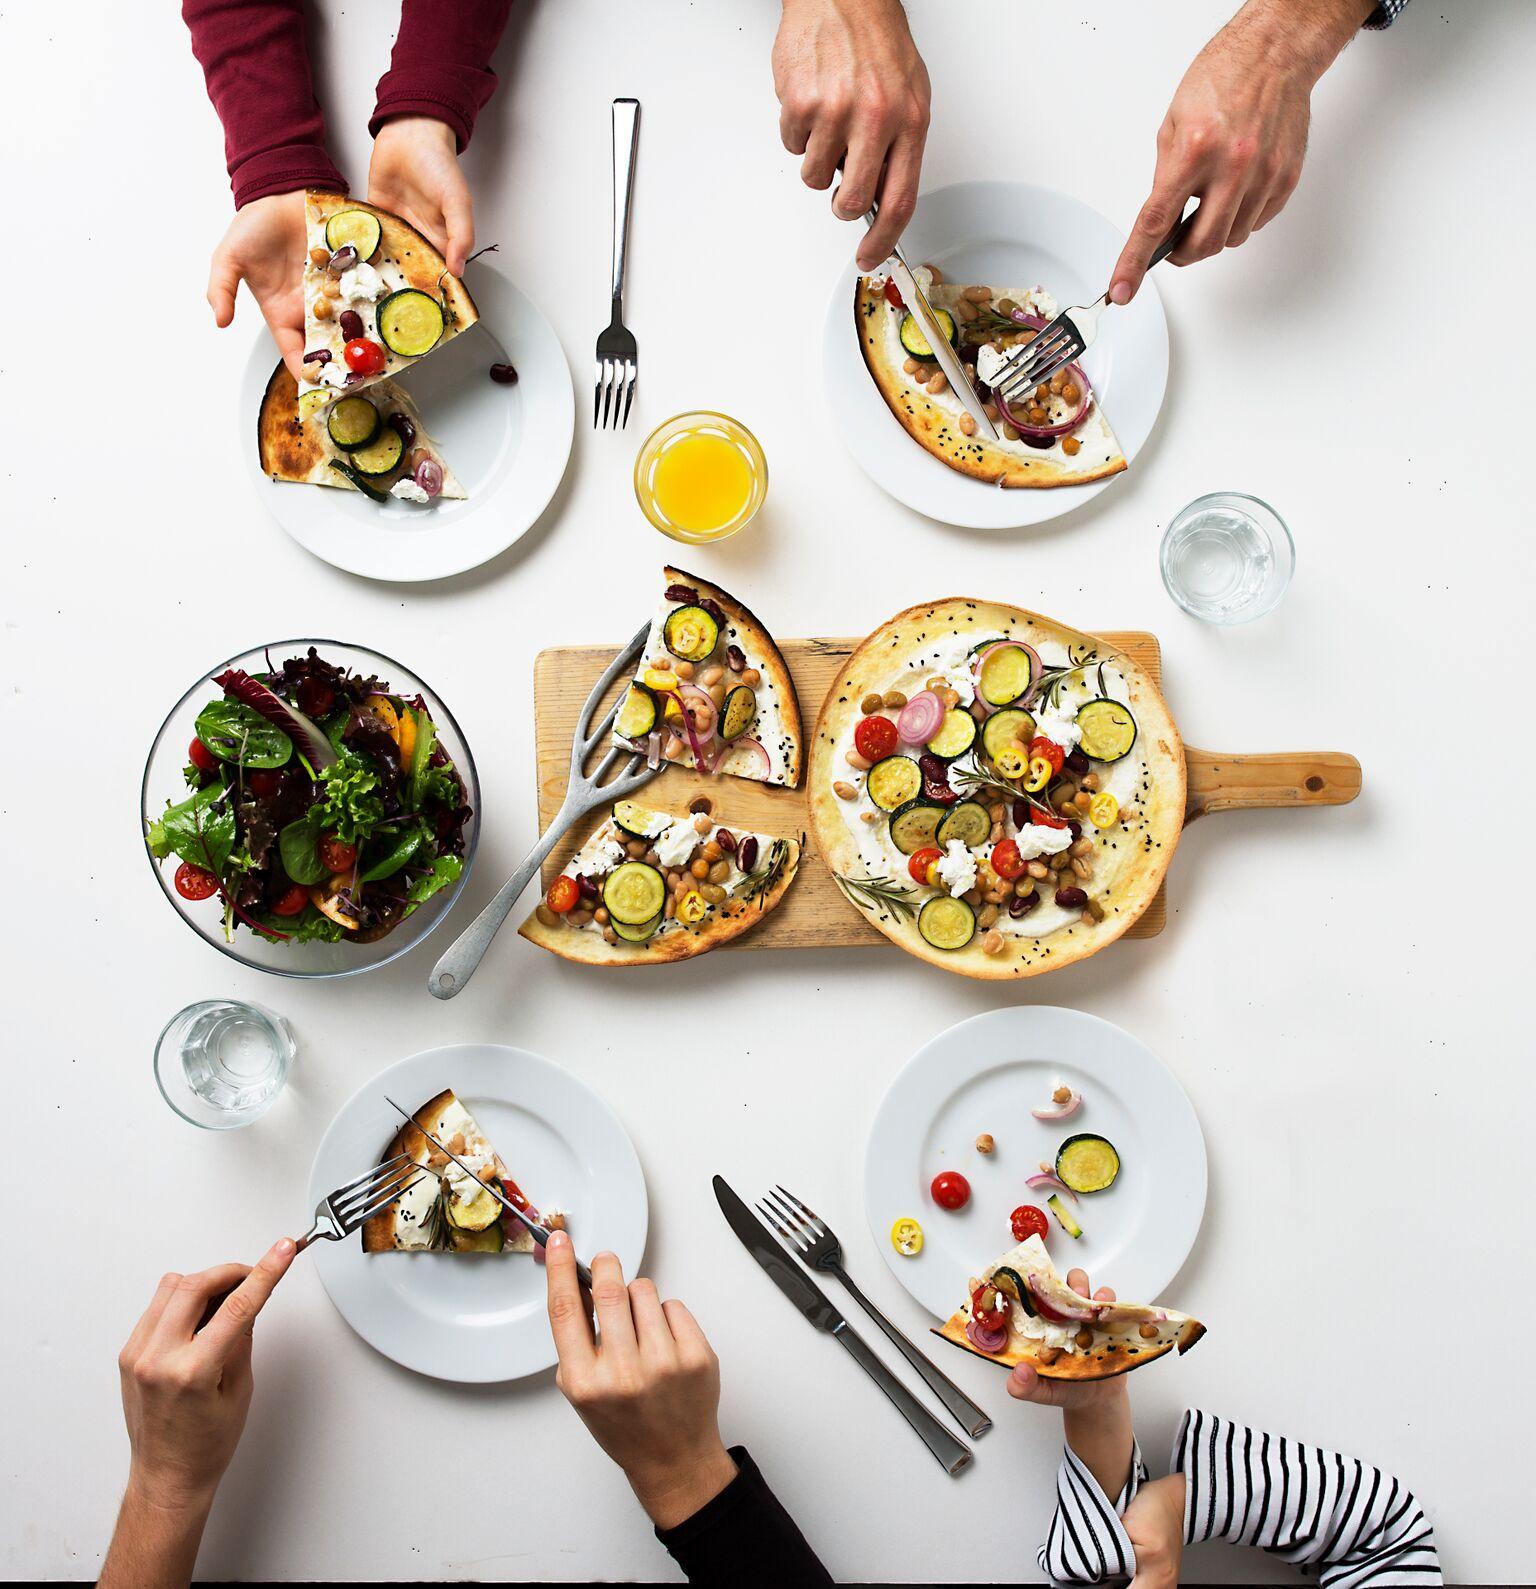 Marley Spoon diner box bezorging krijg €25 korting op je eerste order